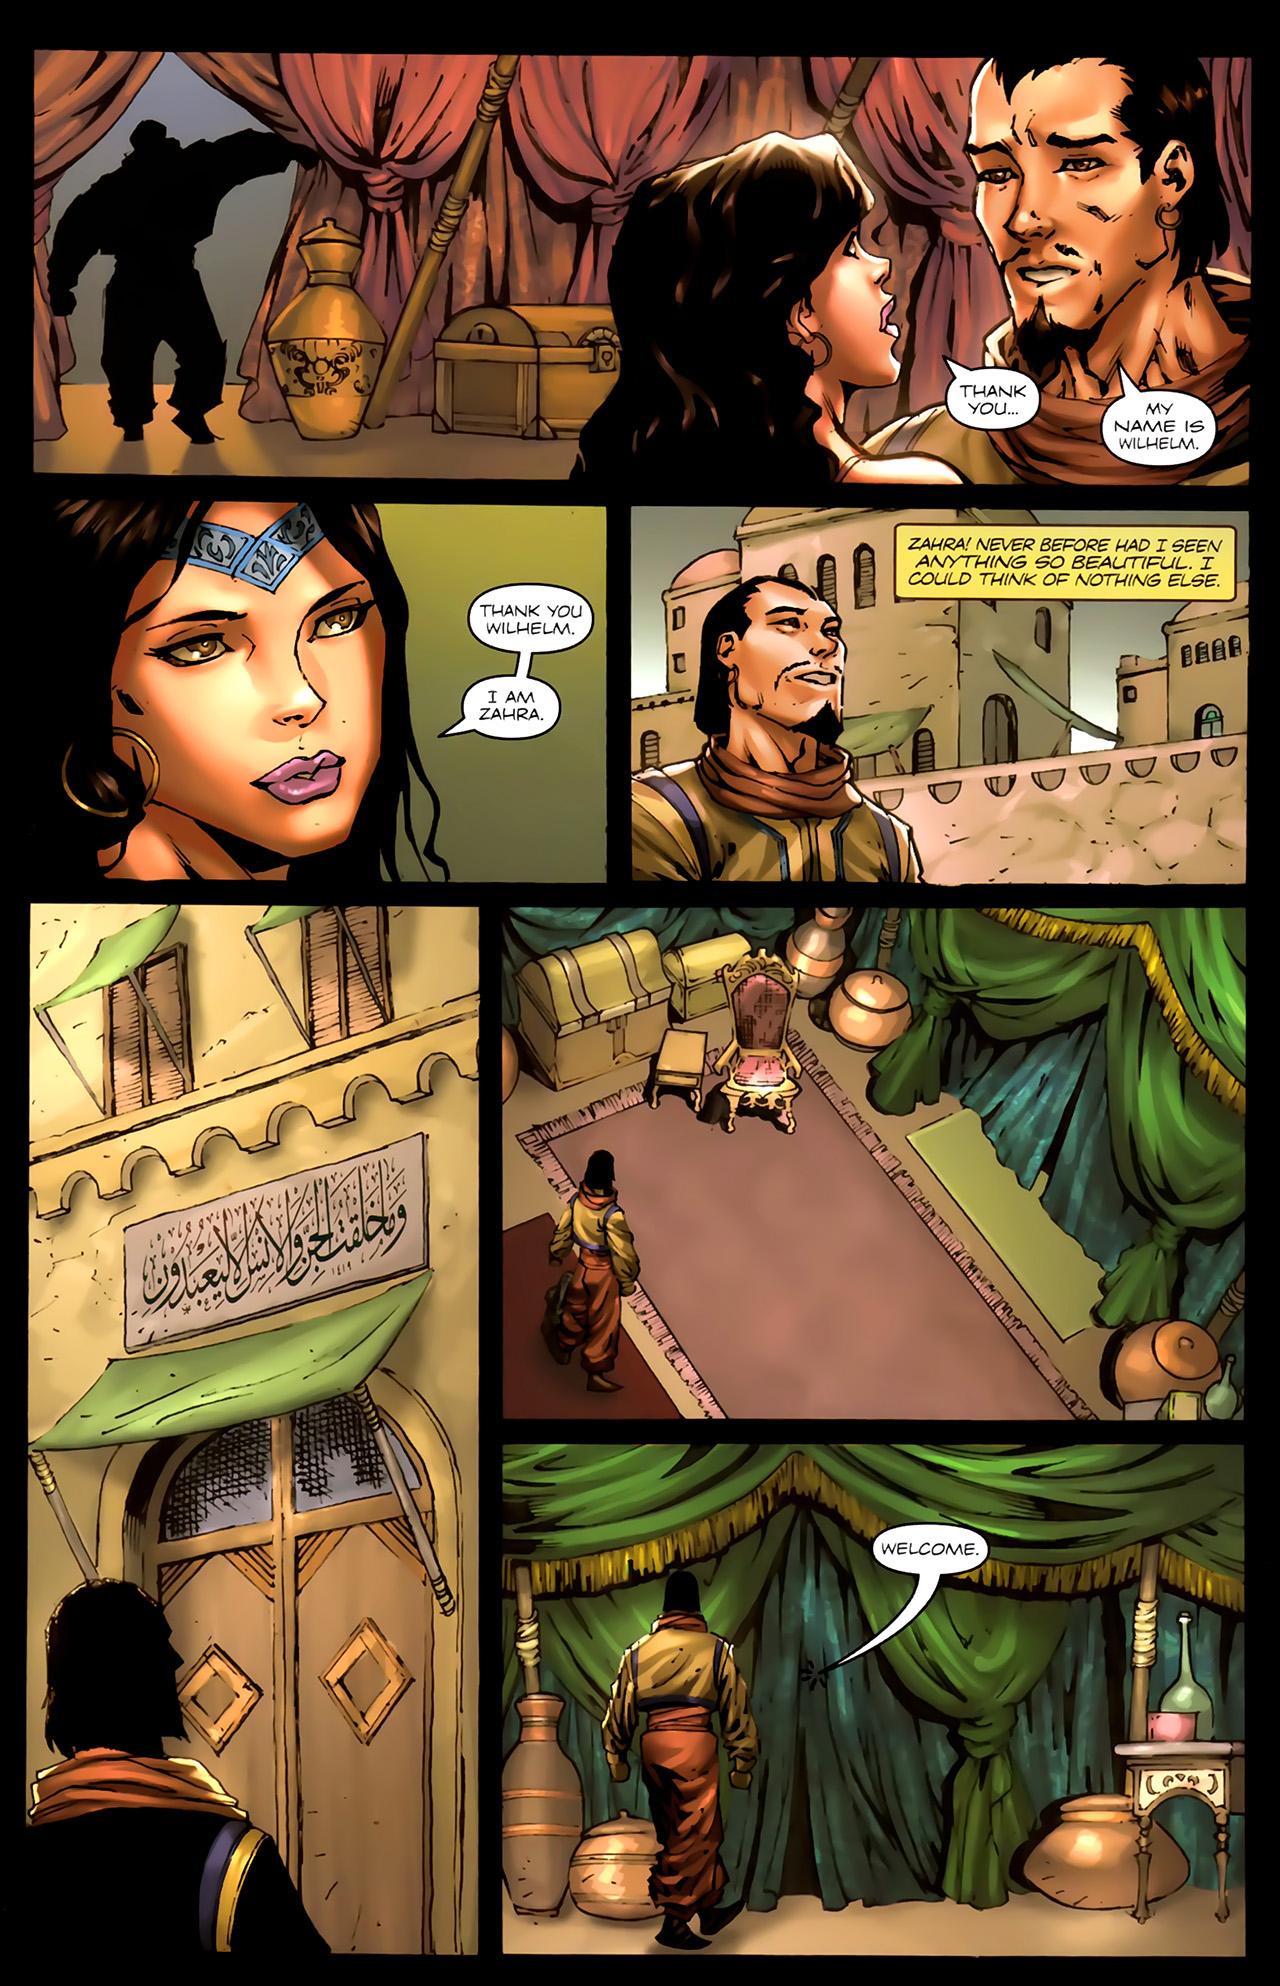 Read online 1001 Arabian Nights: The Adventures of Sinbad comic -  Issue #7 - 10